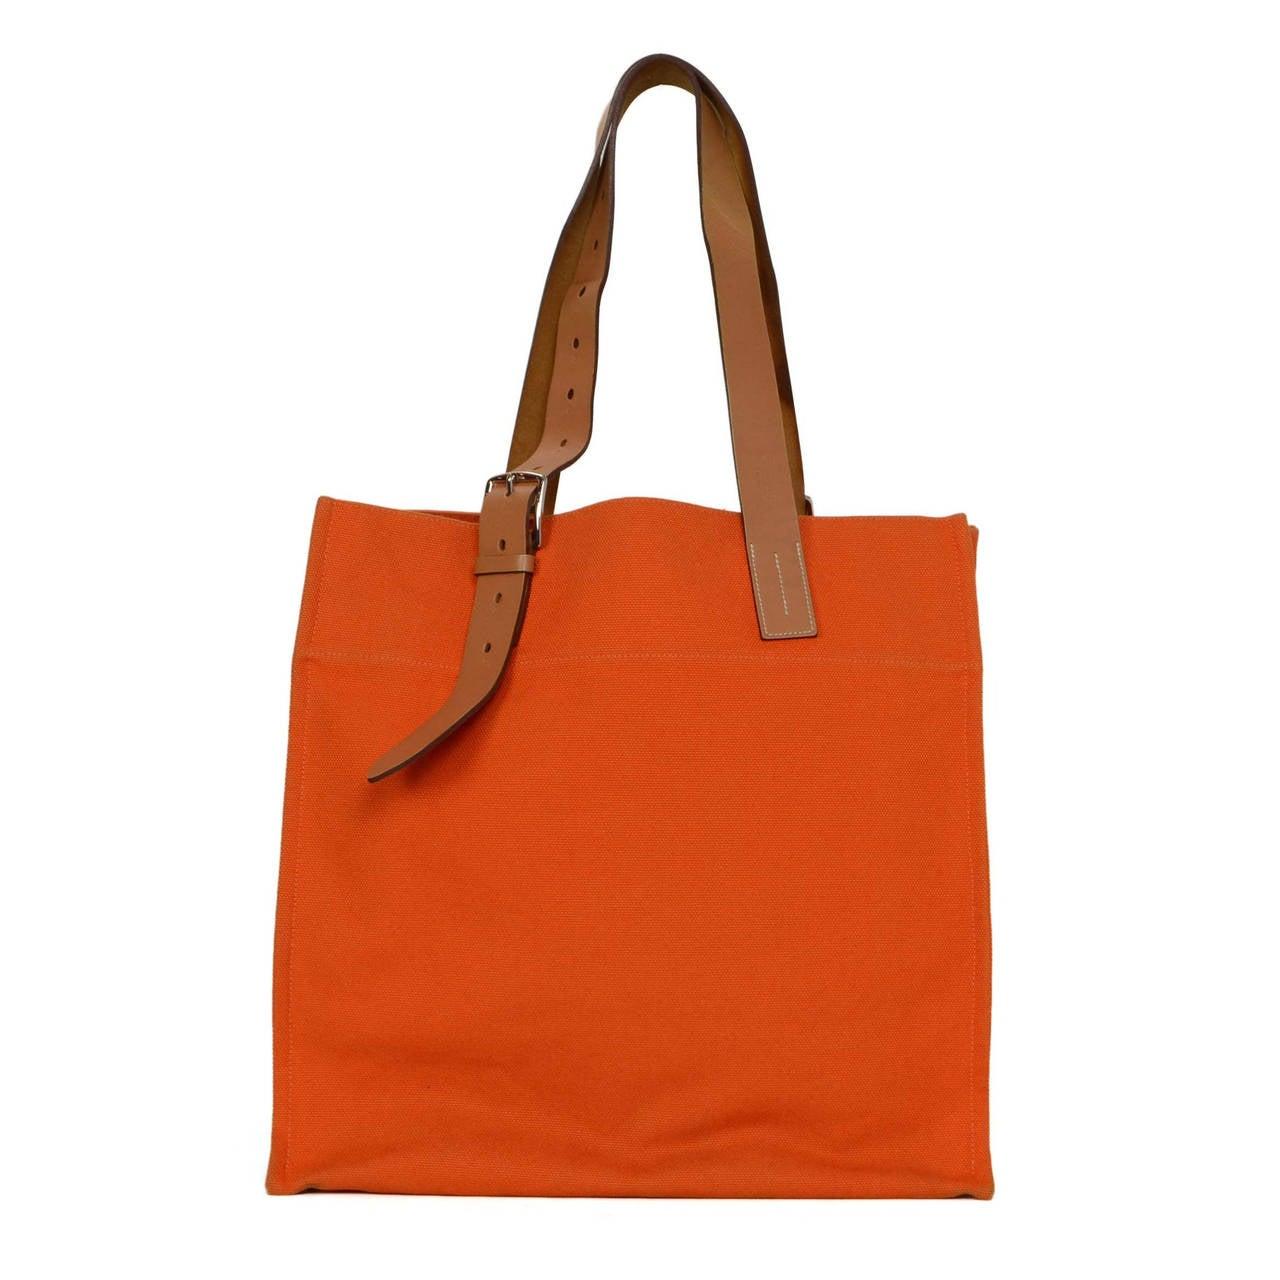 HERMES Orange Canvas Etriviere Tote Bag PHW at 1stdibs